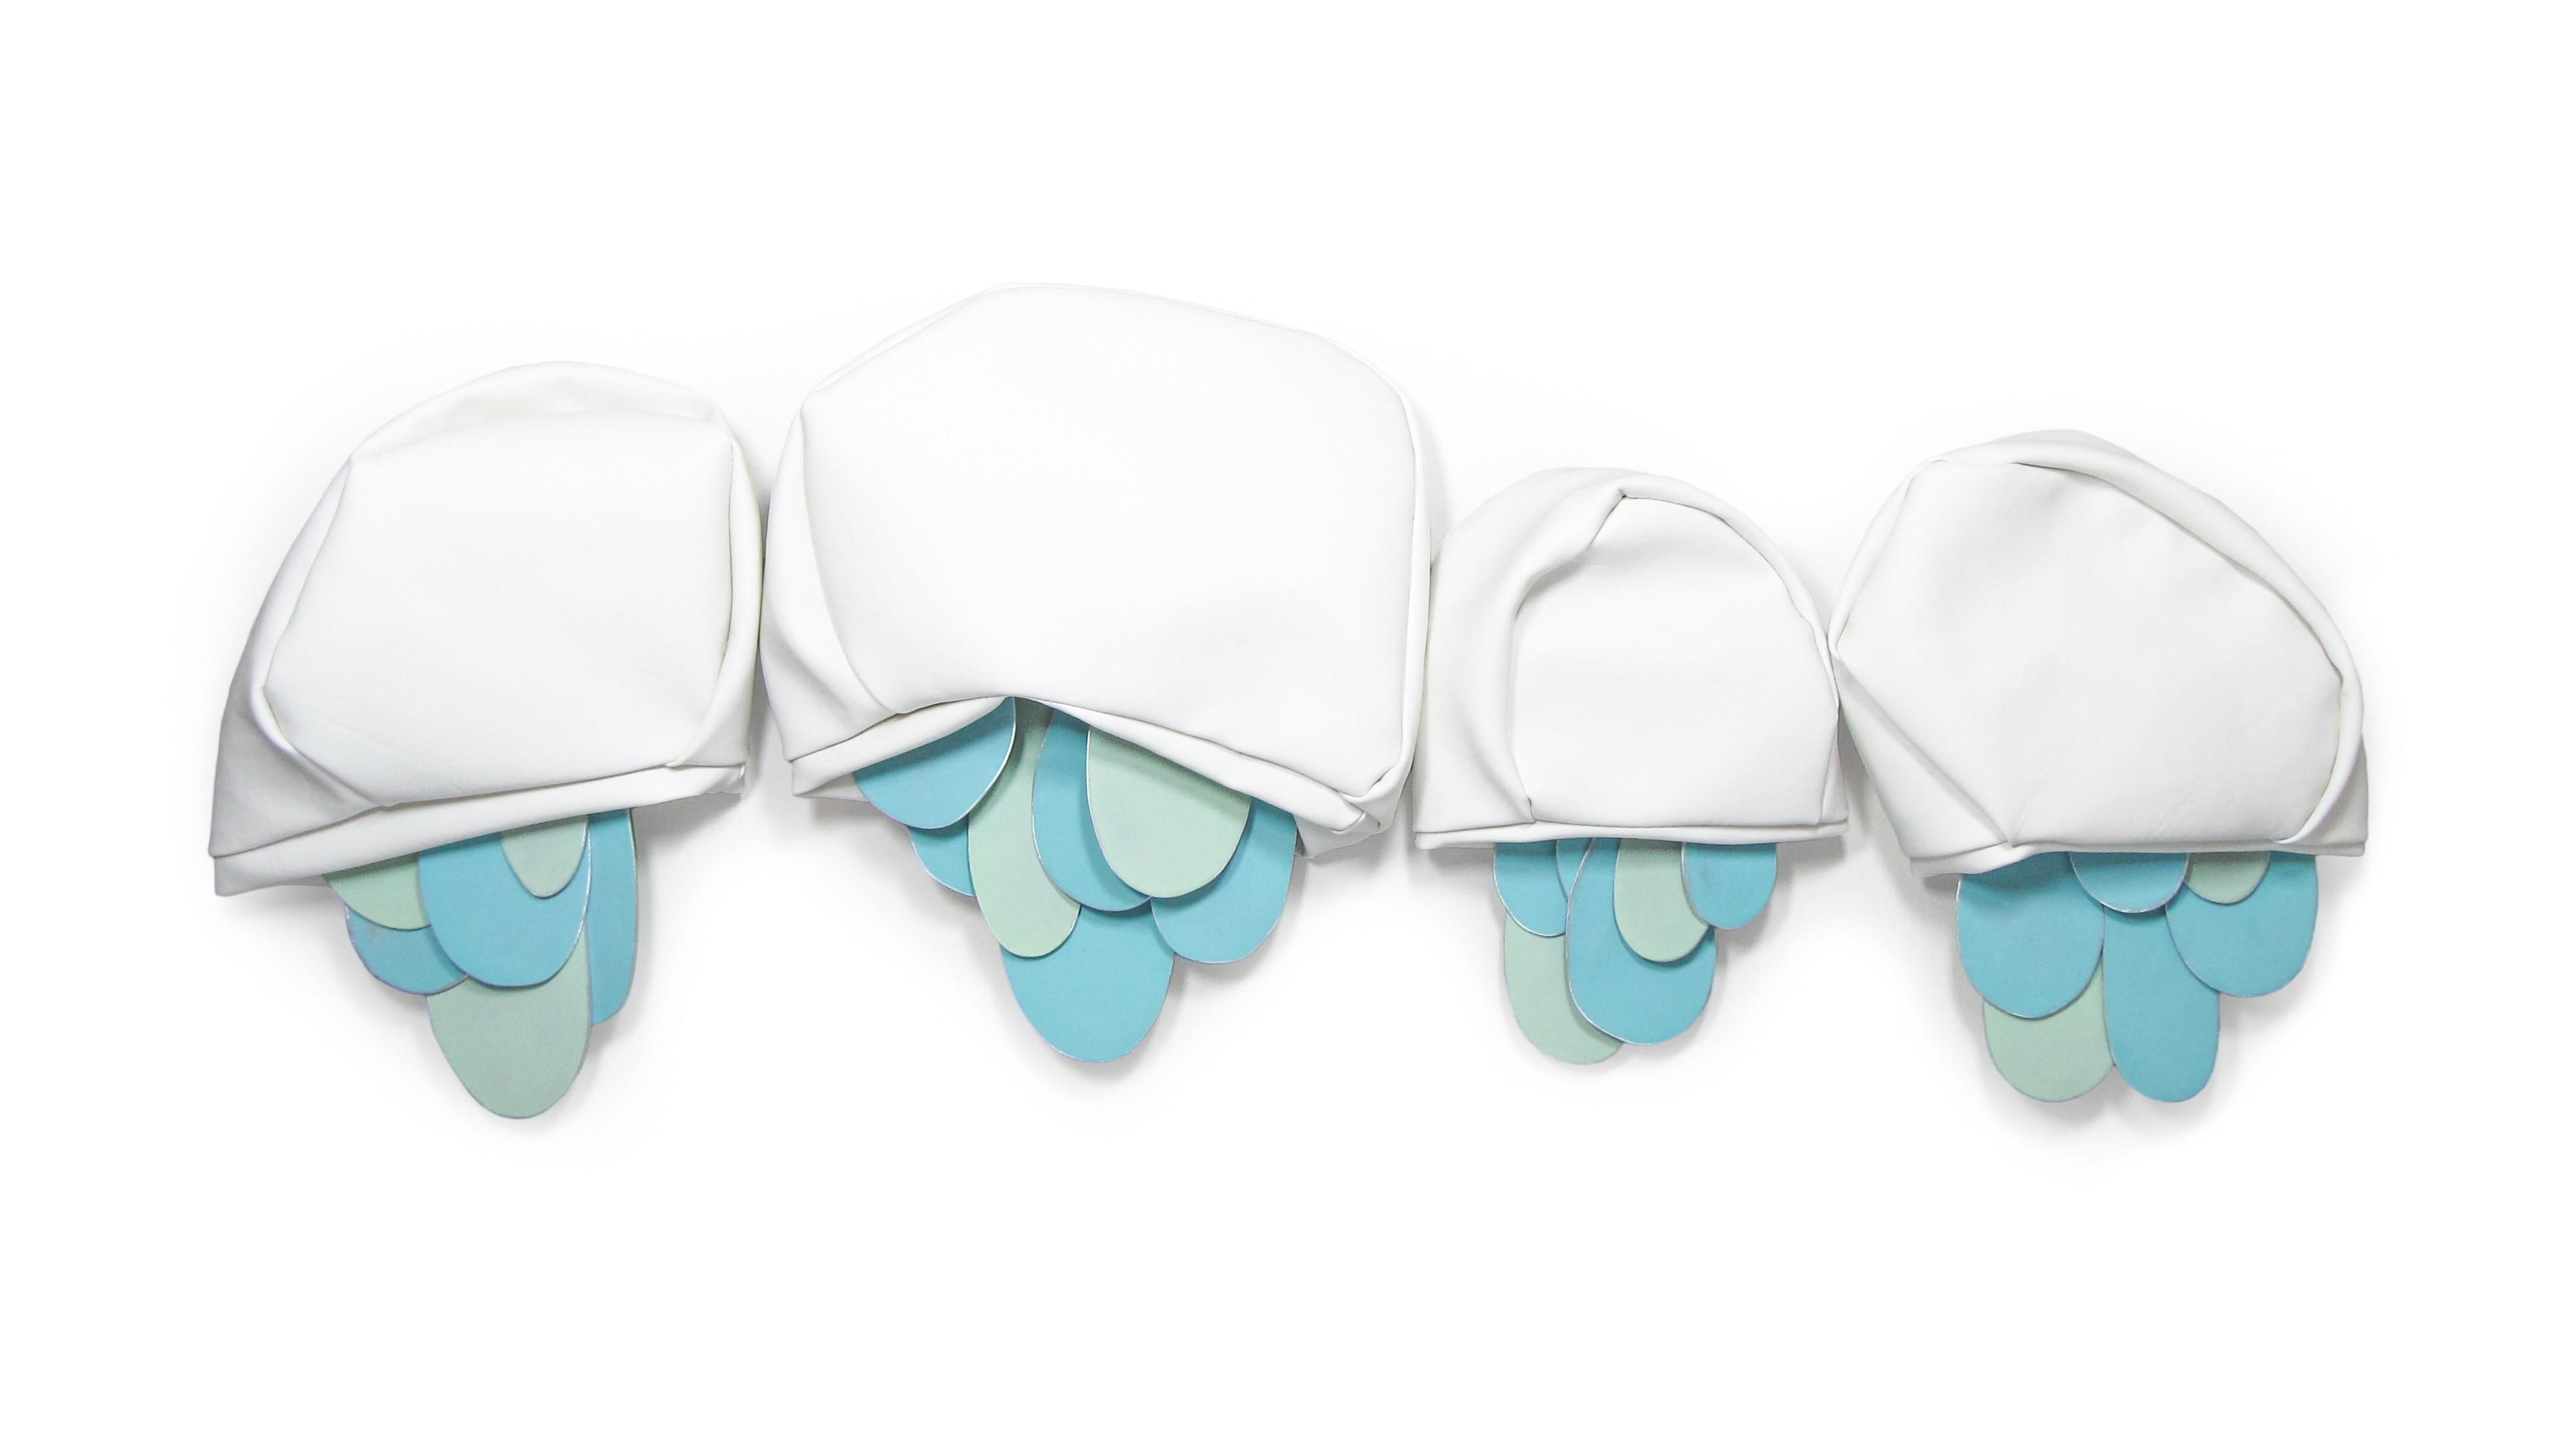 Iceberg Group